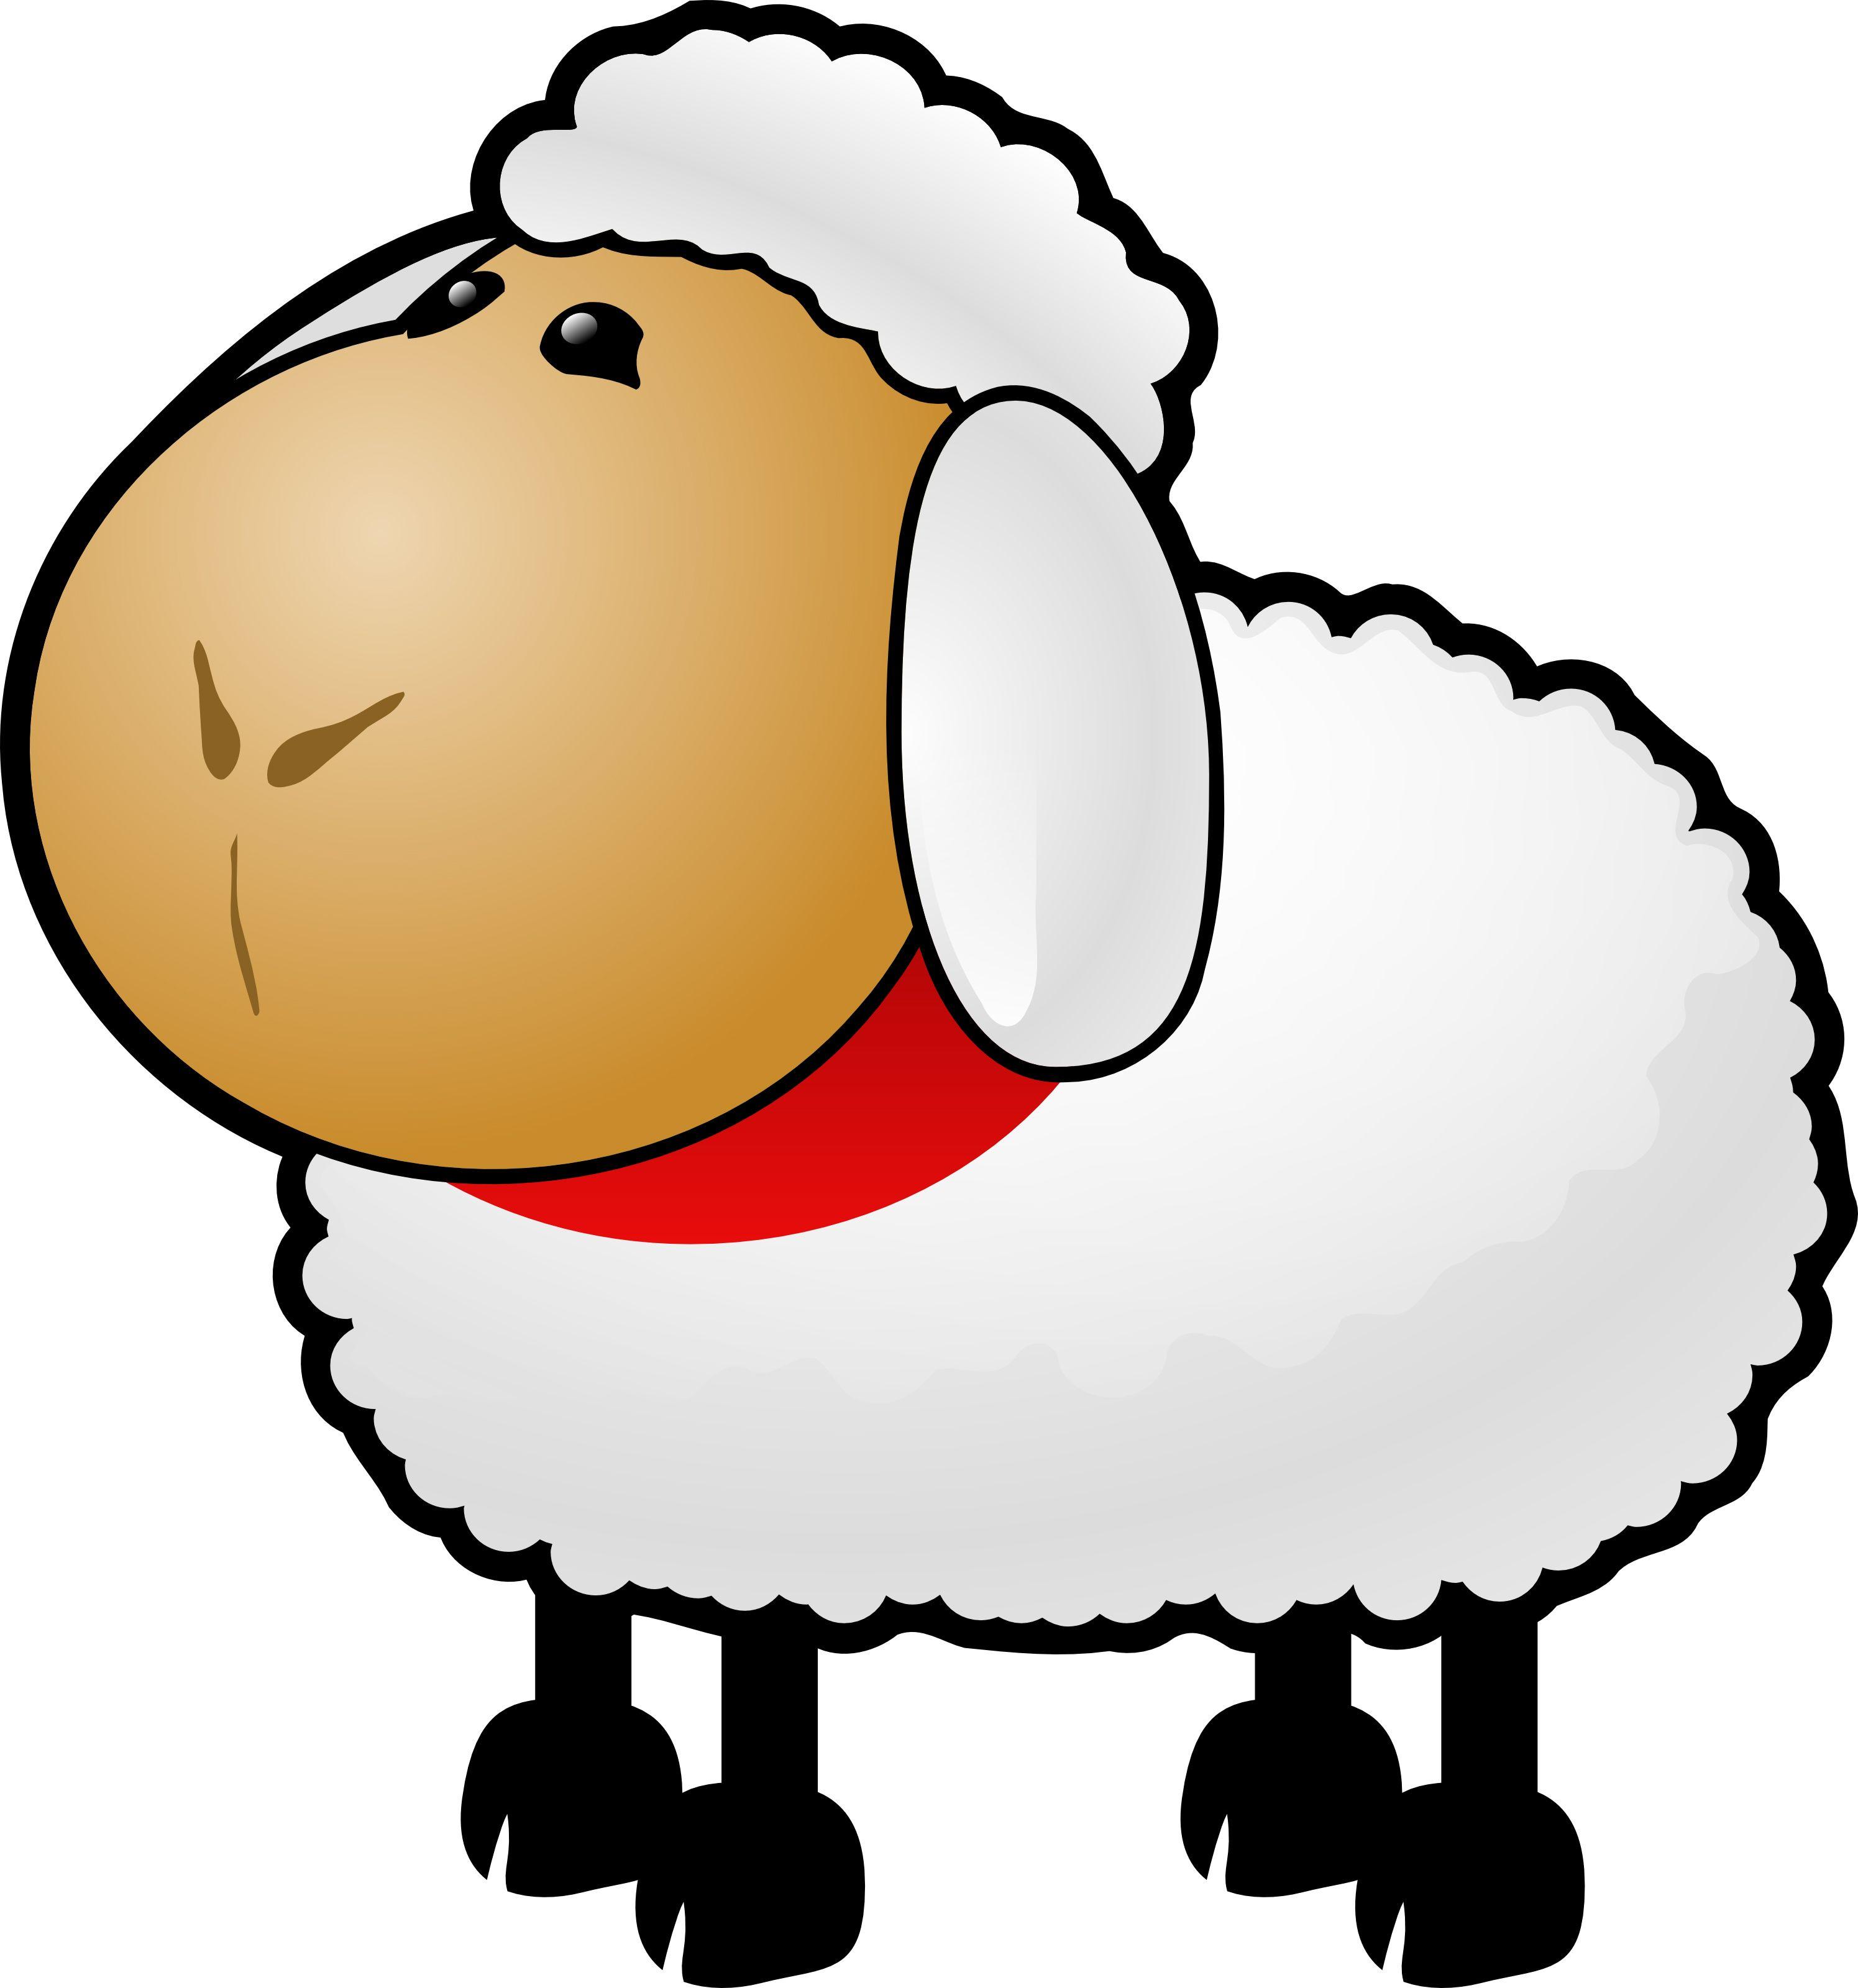 Free Cartoon Sheep Clipart | овечки | козочки 2015 sheep | goat ...